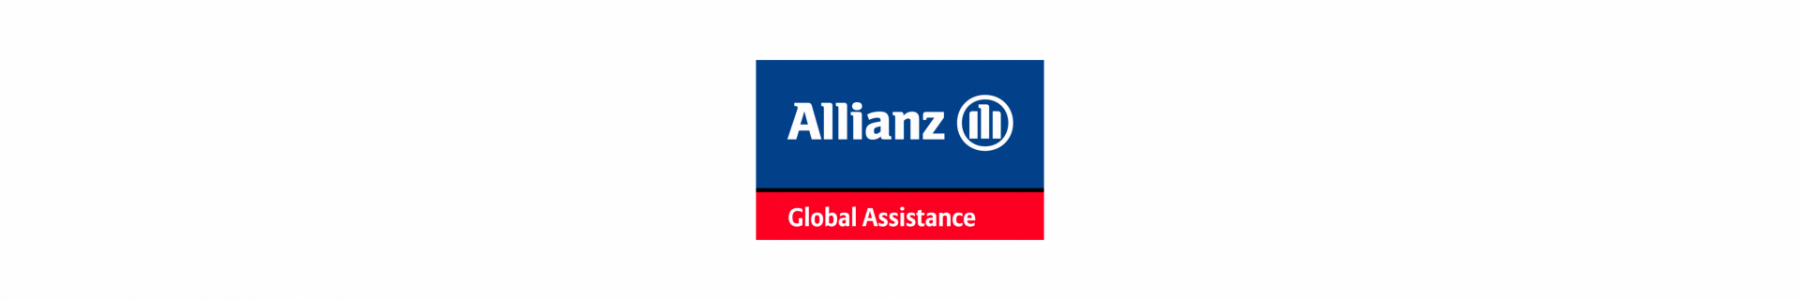 Logone Allianz